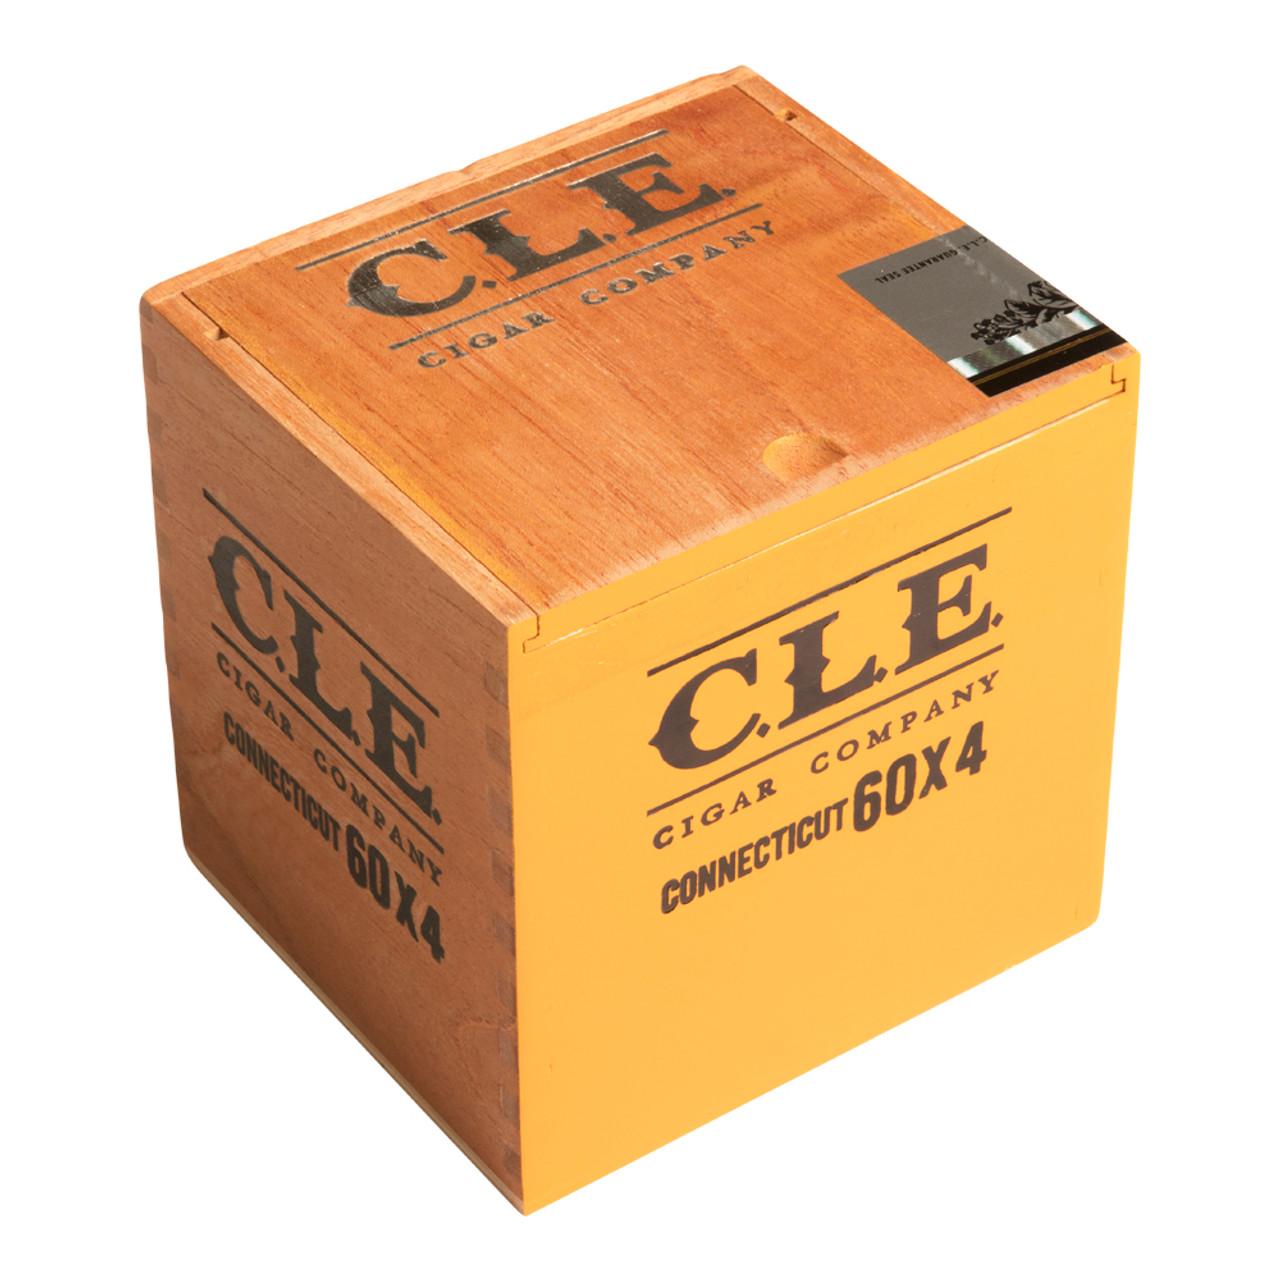 CLE Chaparros Connecticut Cigars - 4 x 70 (Box of 25)